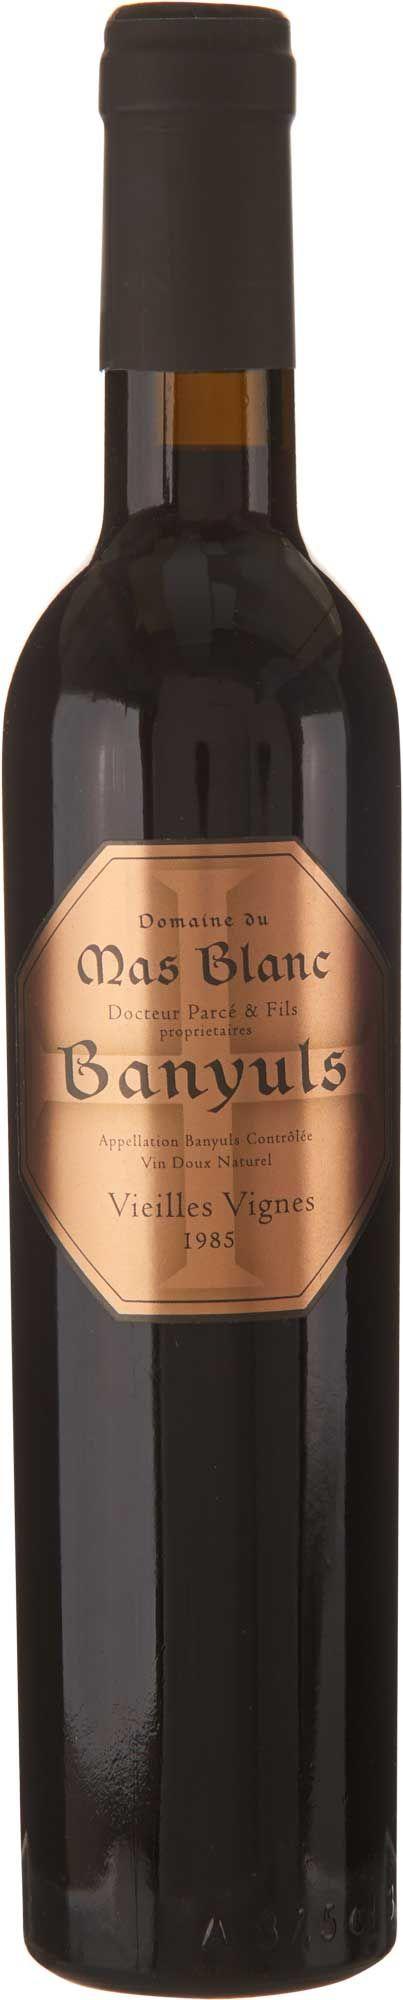 Domaine du Mas Blanc Banyuls